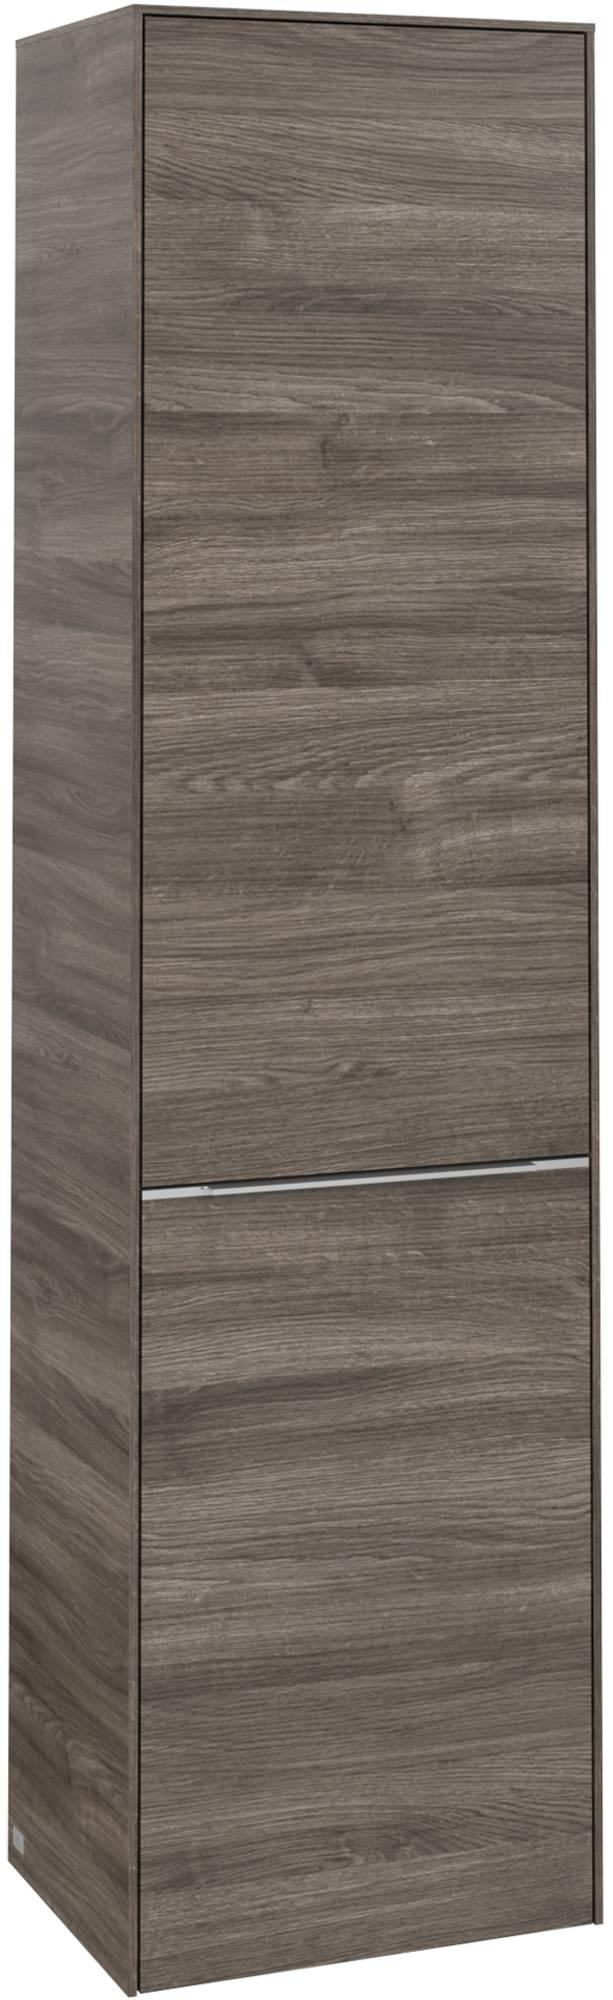 Villeroy & Boch Subway 3.0 Hoge kast 45x36,2x171 cm Stone Oak